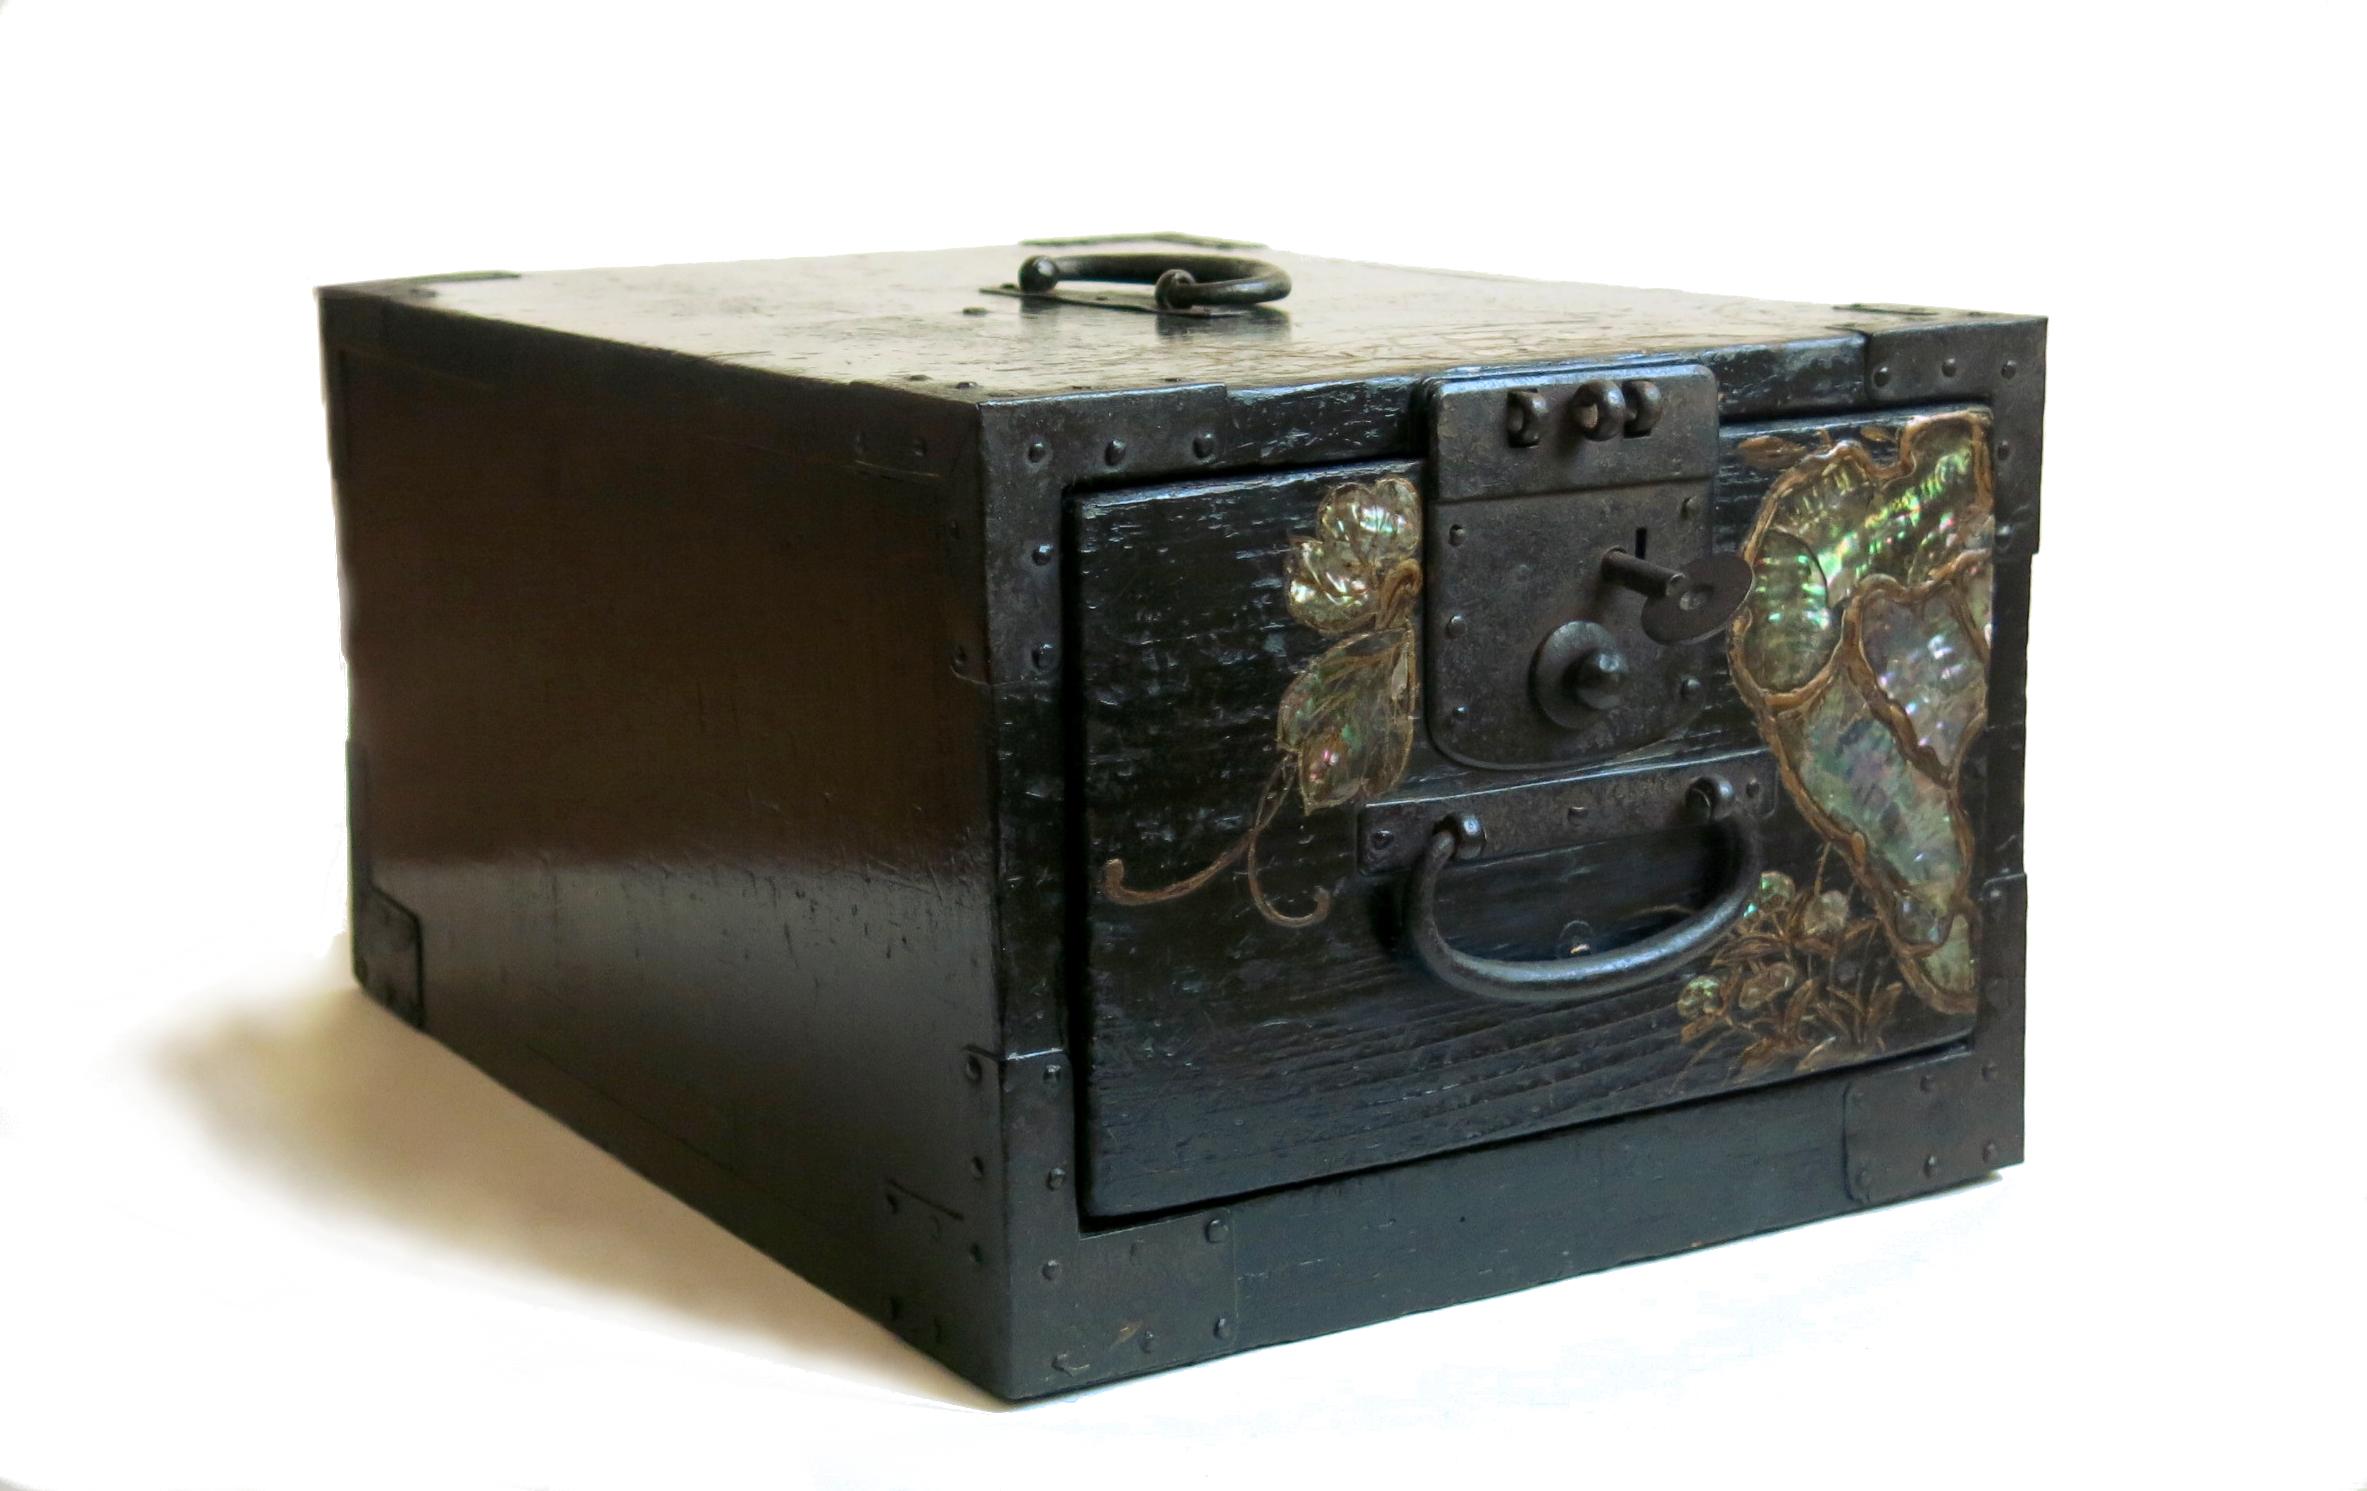 coffre de marine reflets des arts. Black Bedroom Furniture Sets. Home Design Ideas